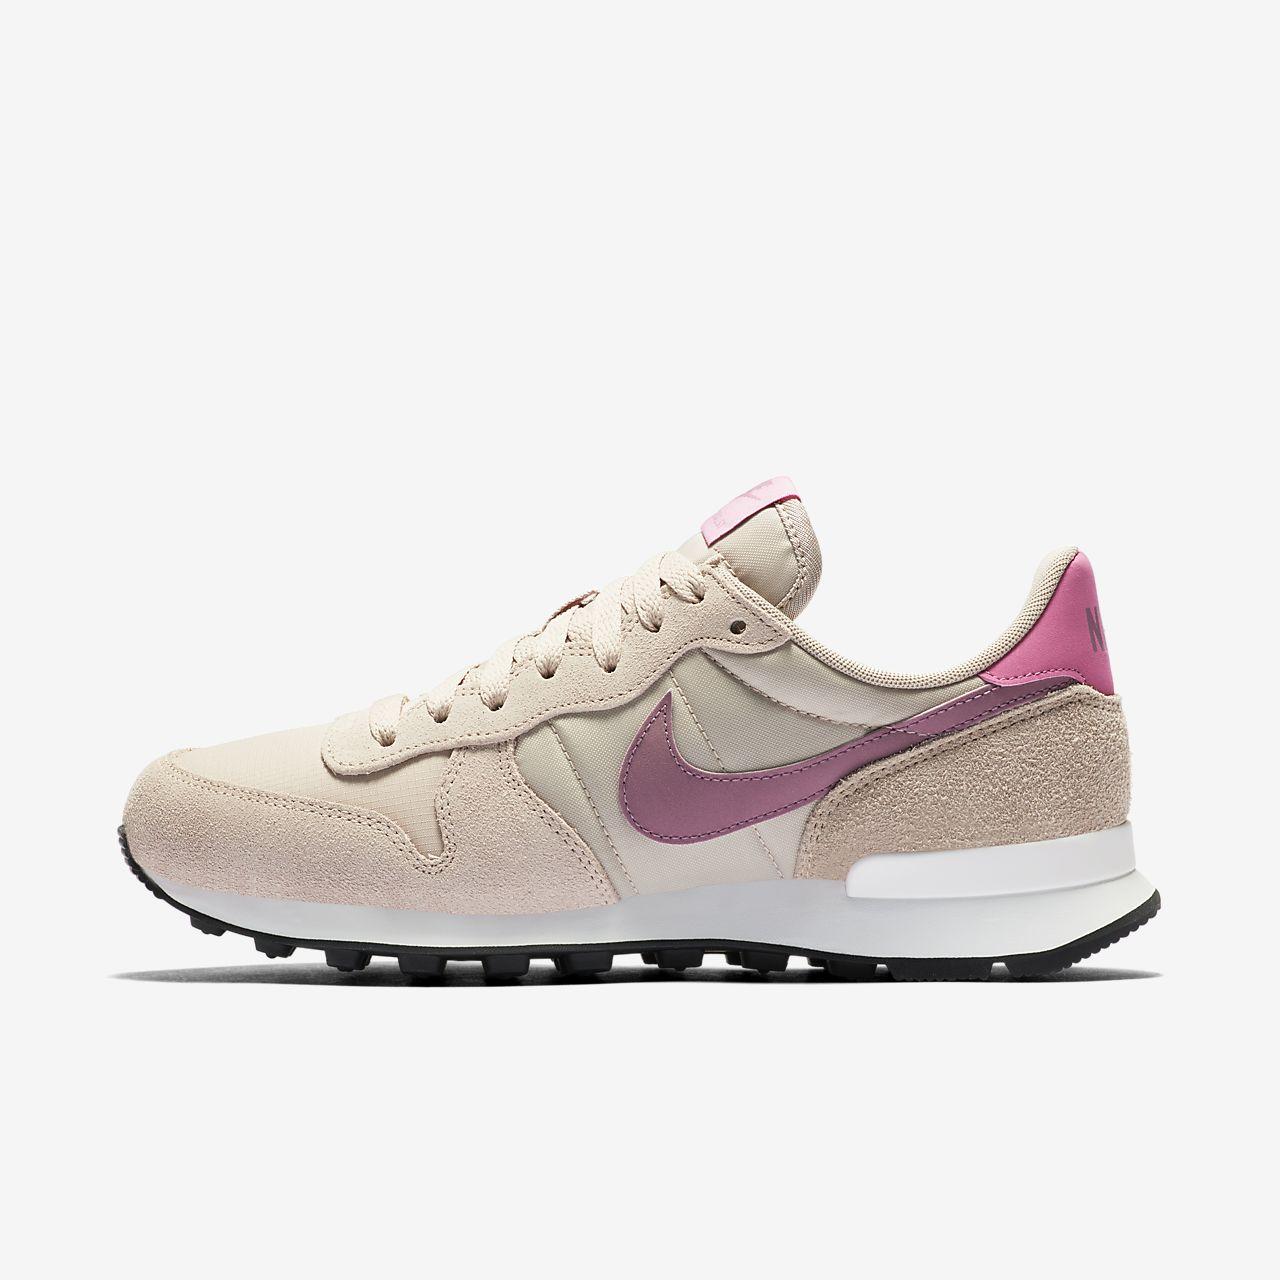 Chaussure Nike Internationalist pour Femme